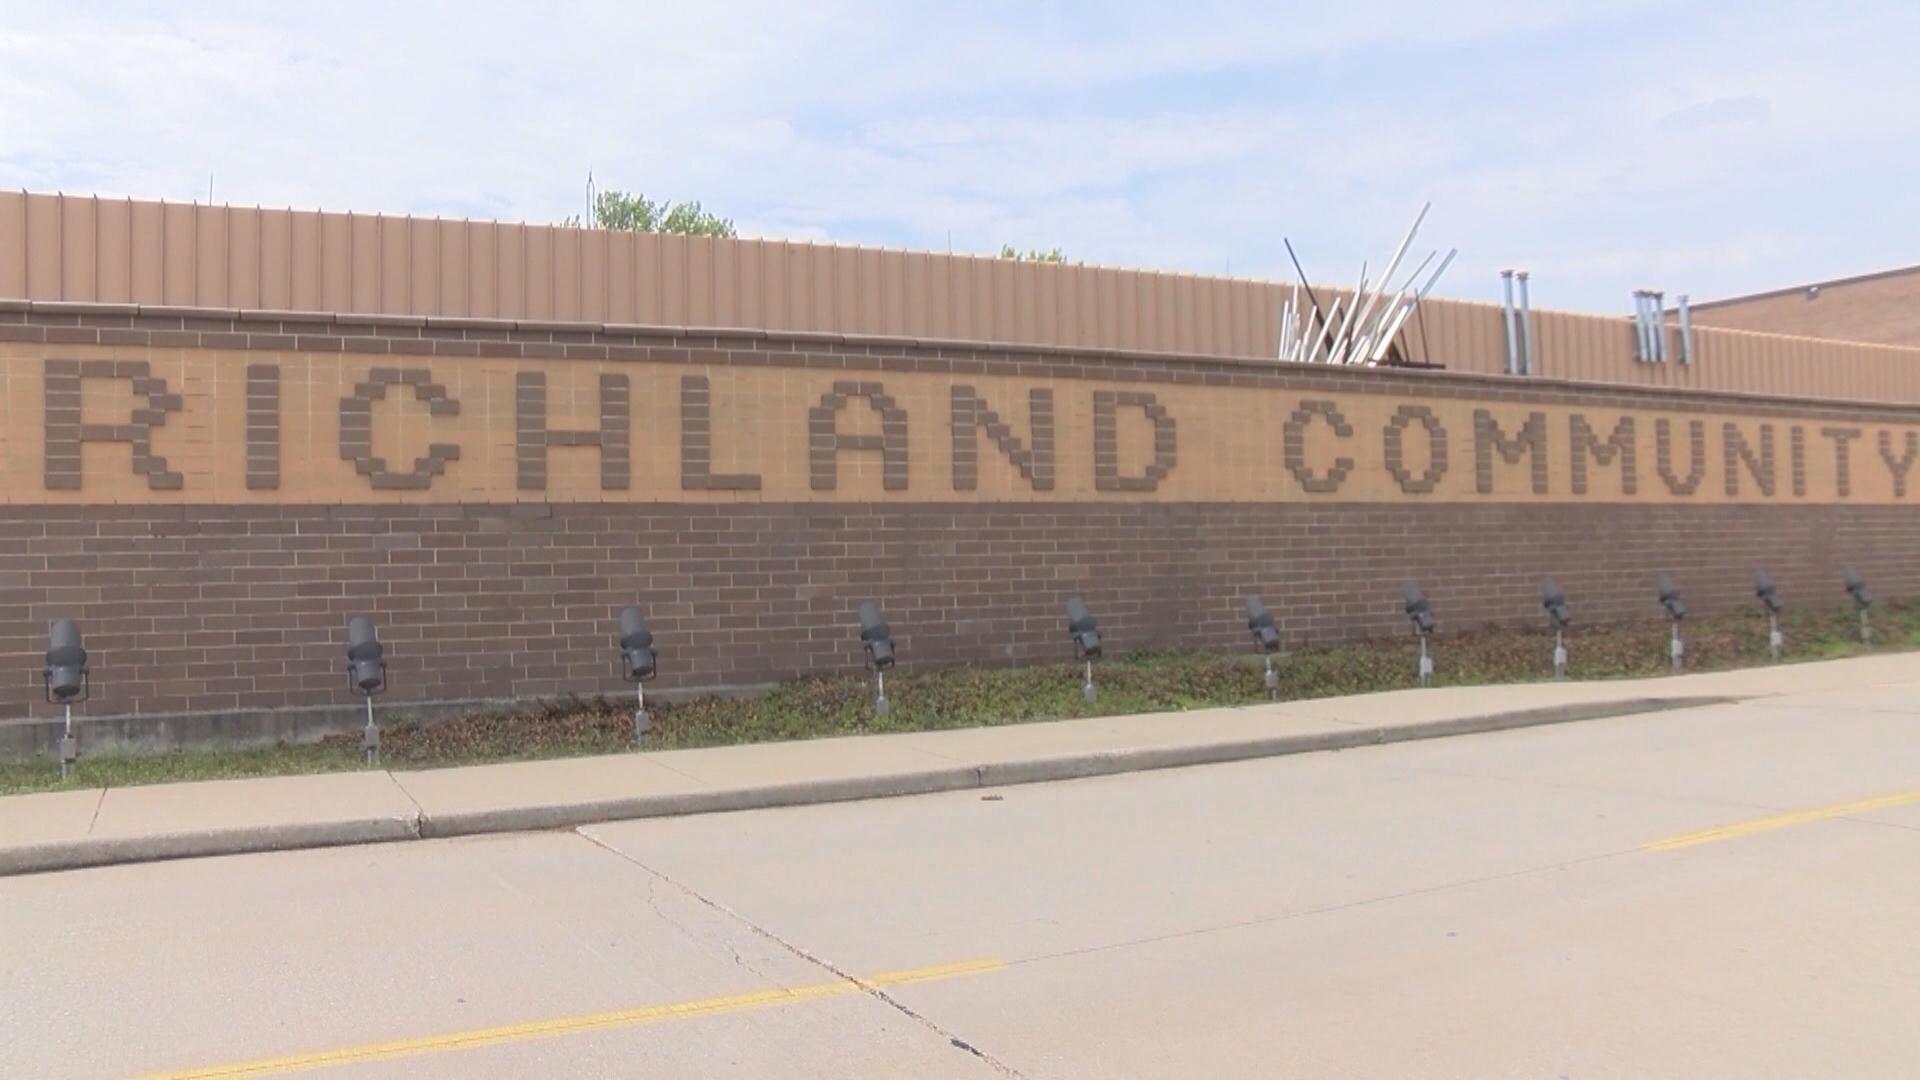 richland community college (2)_1557350059996.jpg.jpg